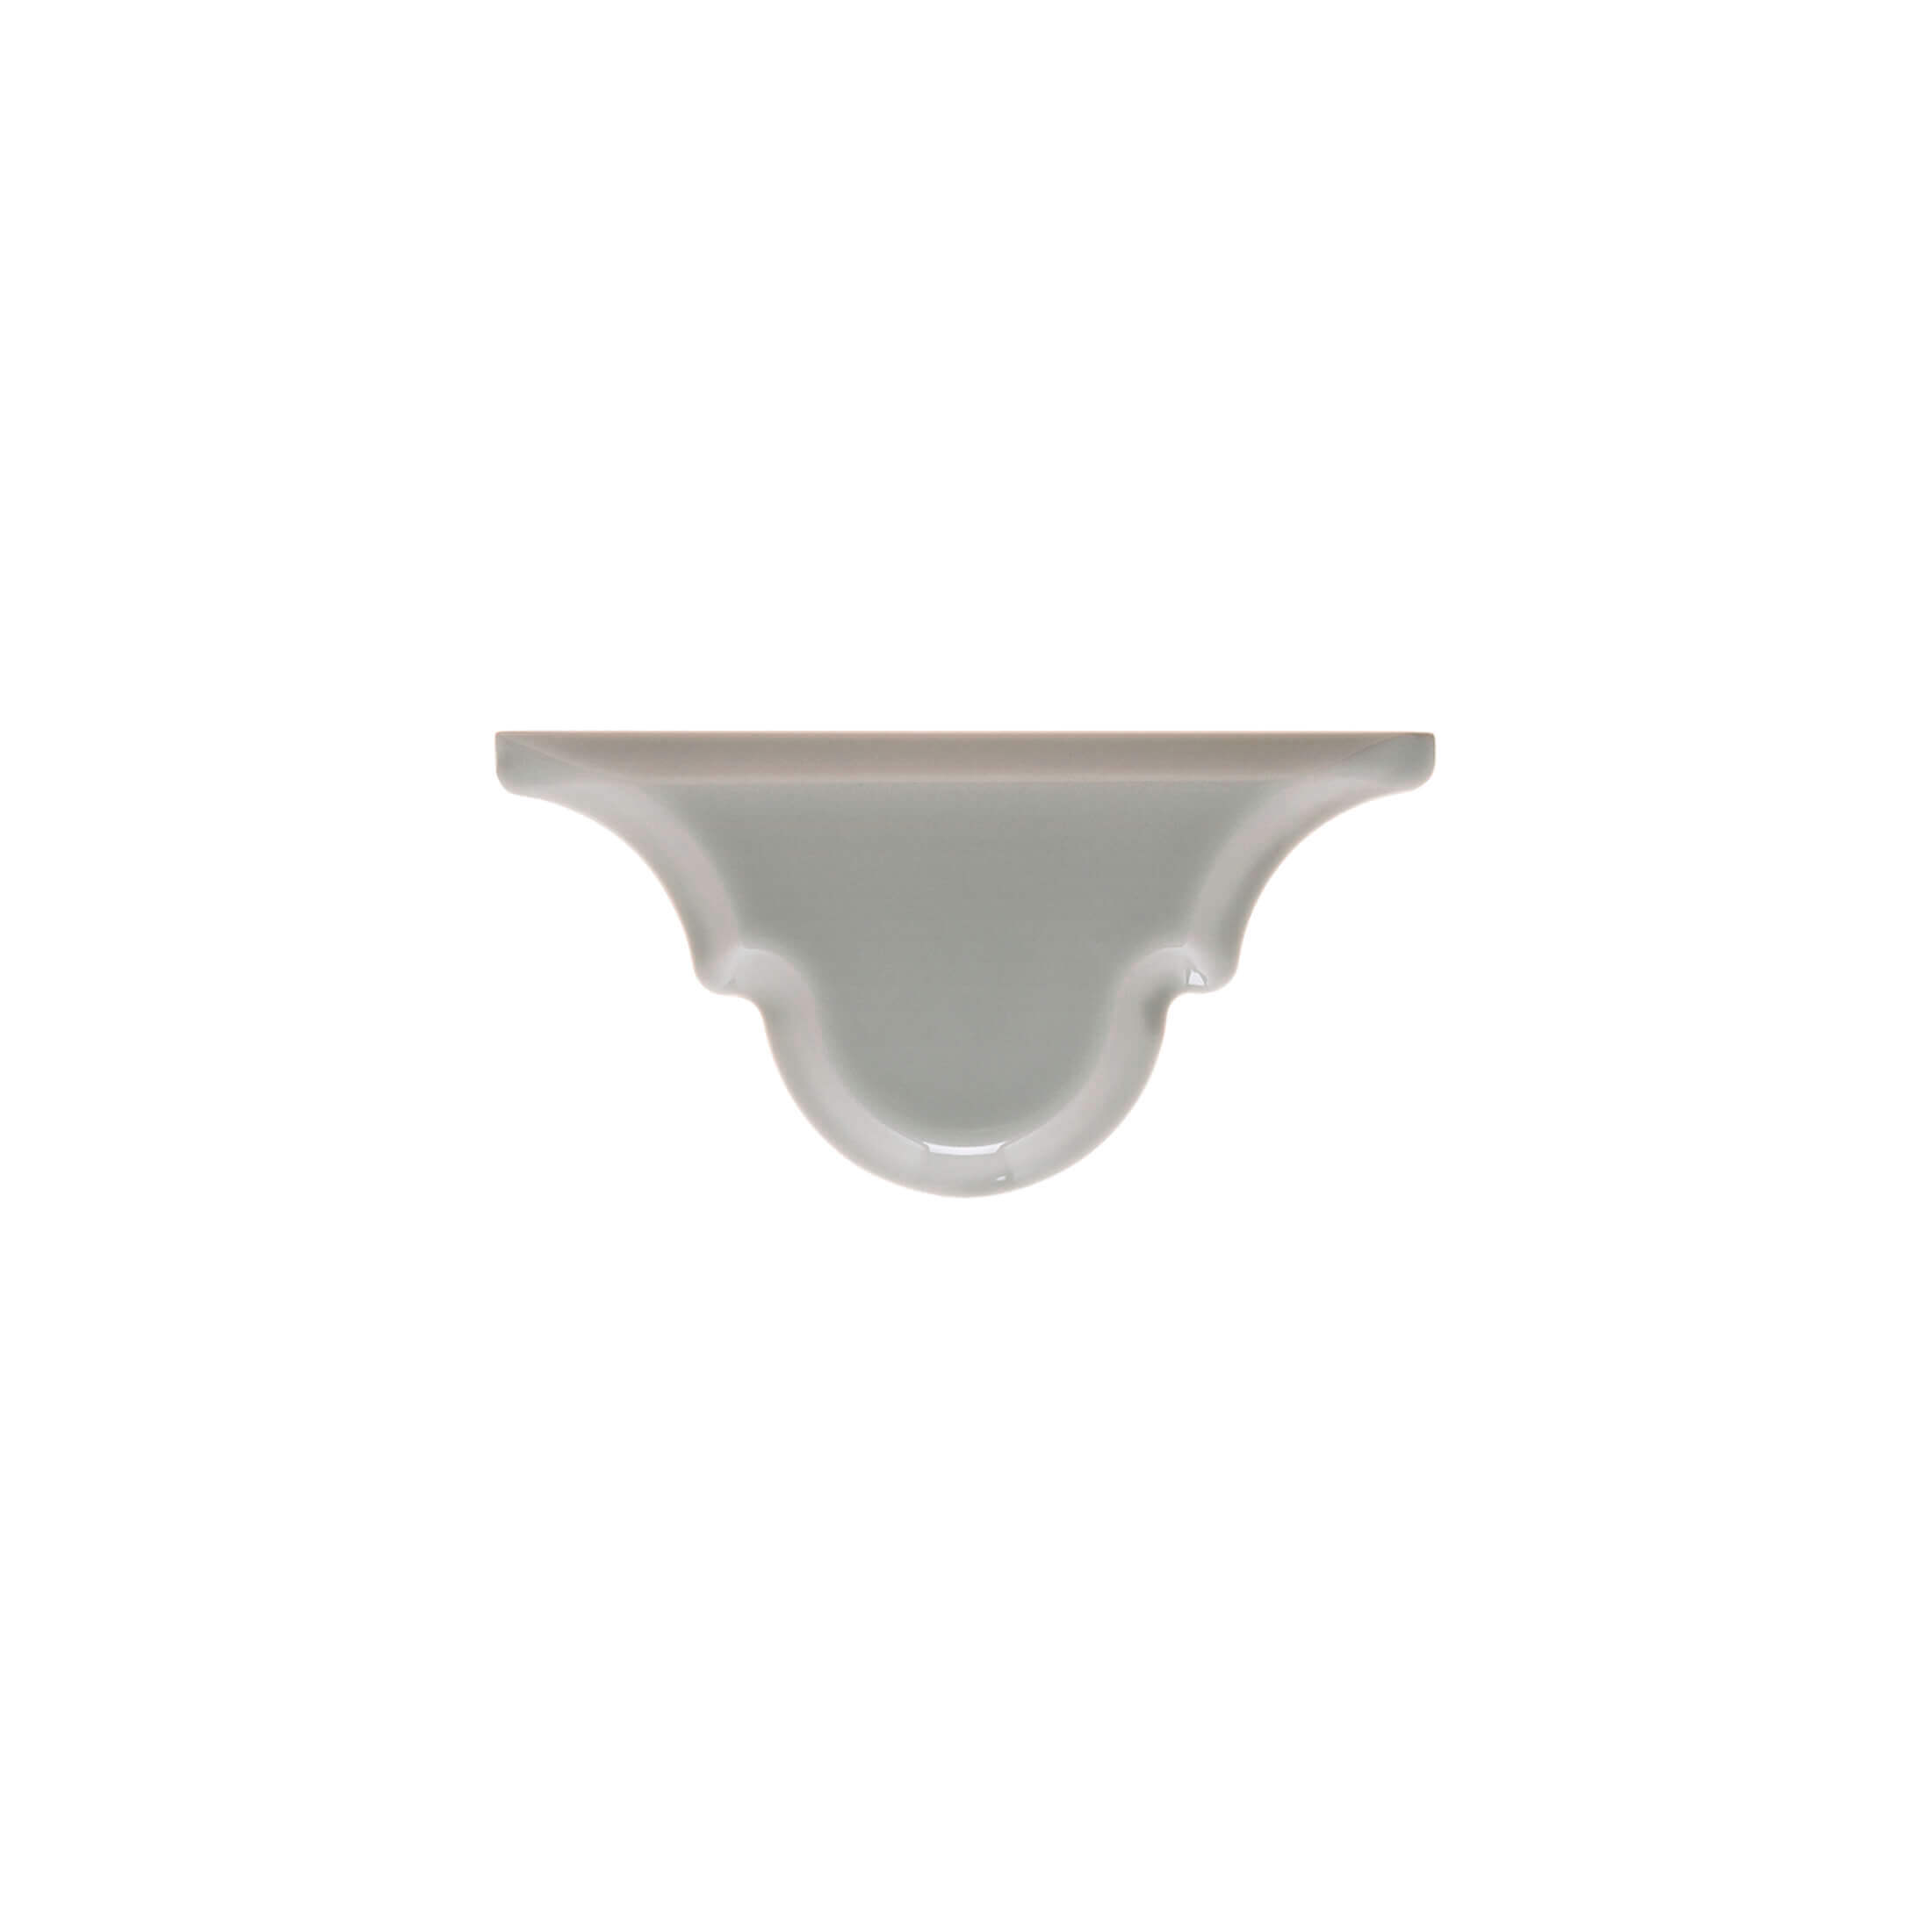 ADST8014 - ARABESCO REMATE GRAYSTONE - 7.5 cm X 15 cm